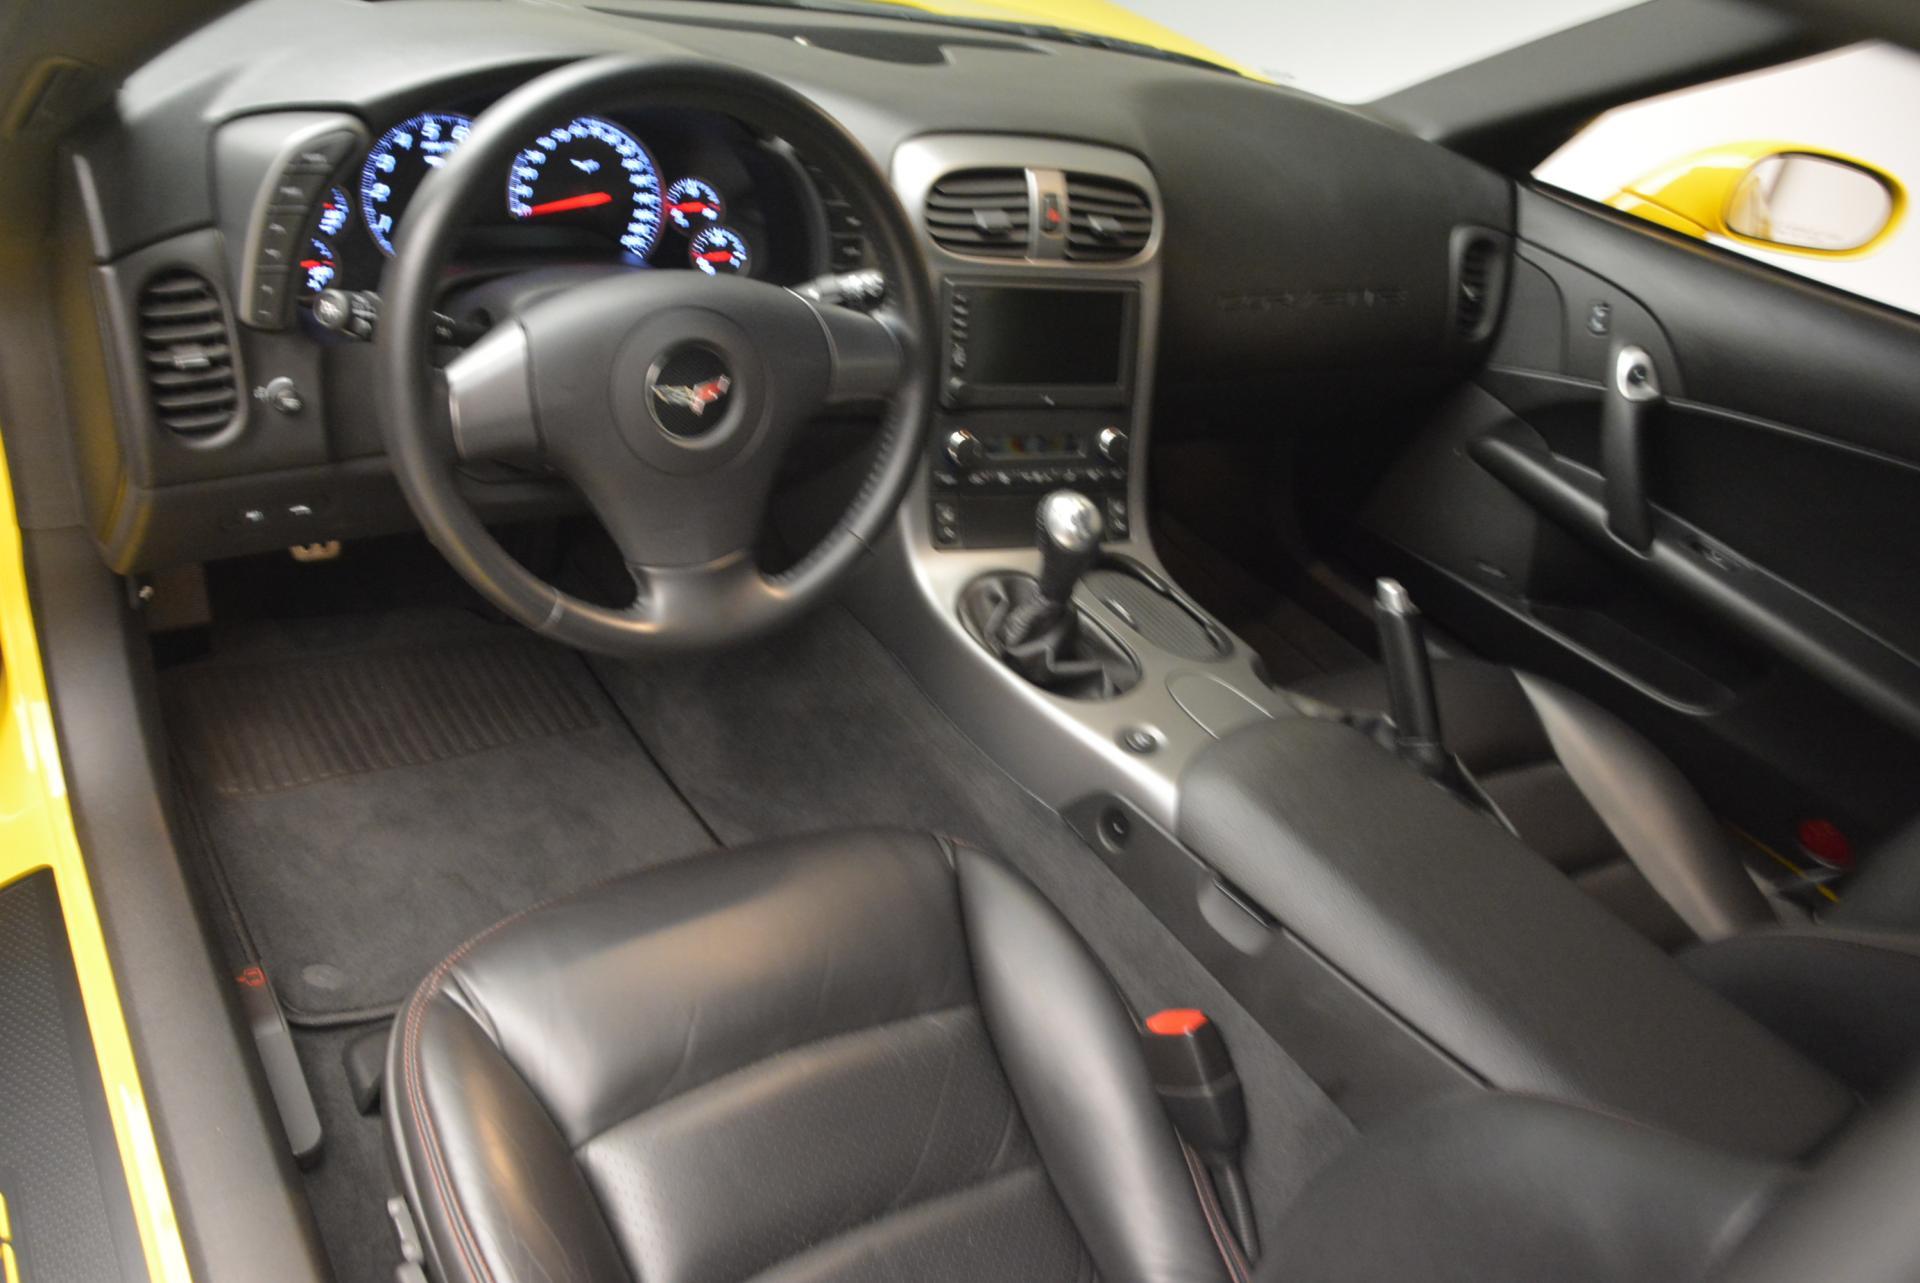 Used 2006 Chevrolet Corvette Z06 Hardtop For Sale In Westport, CT 530_p12